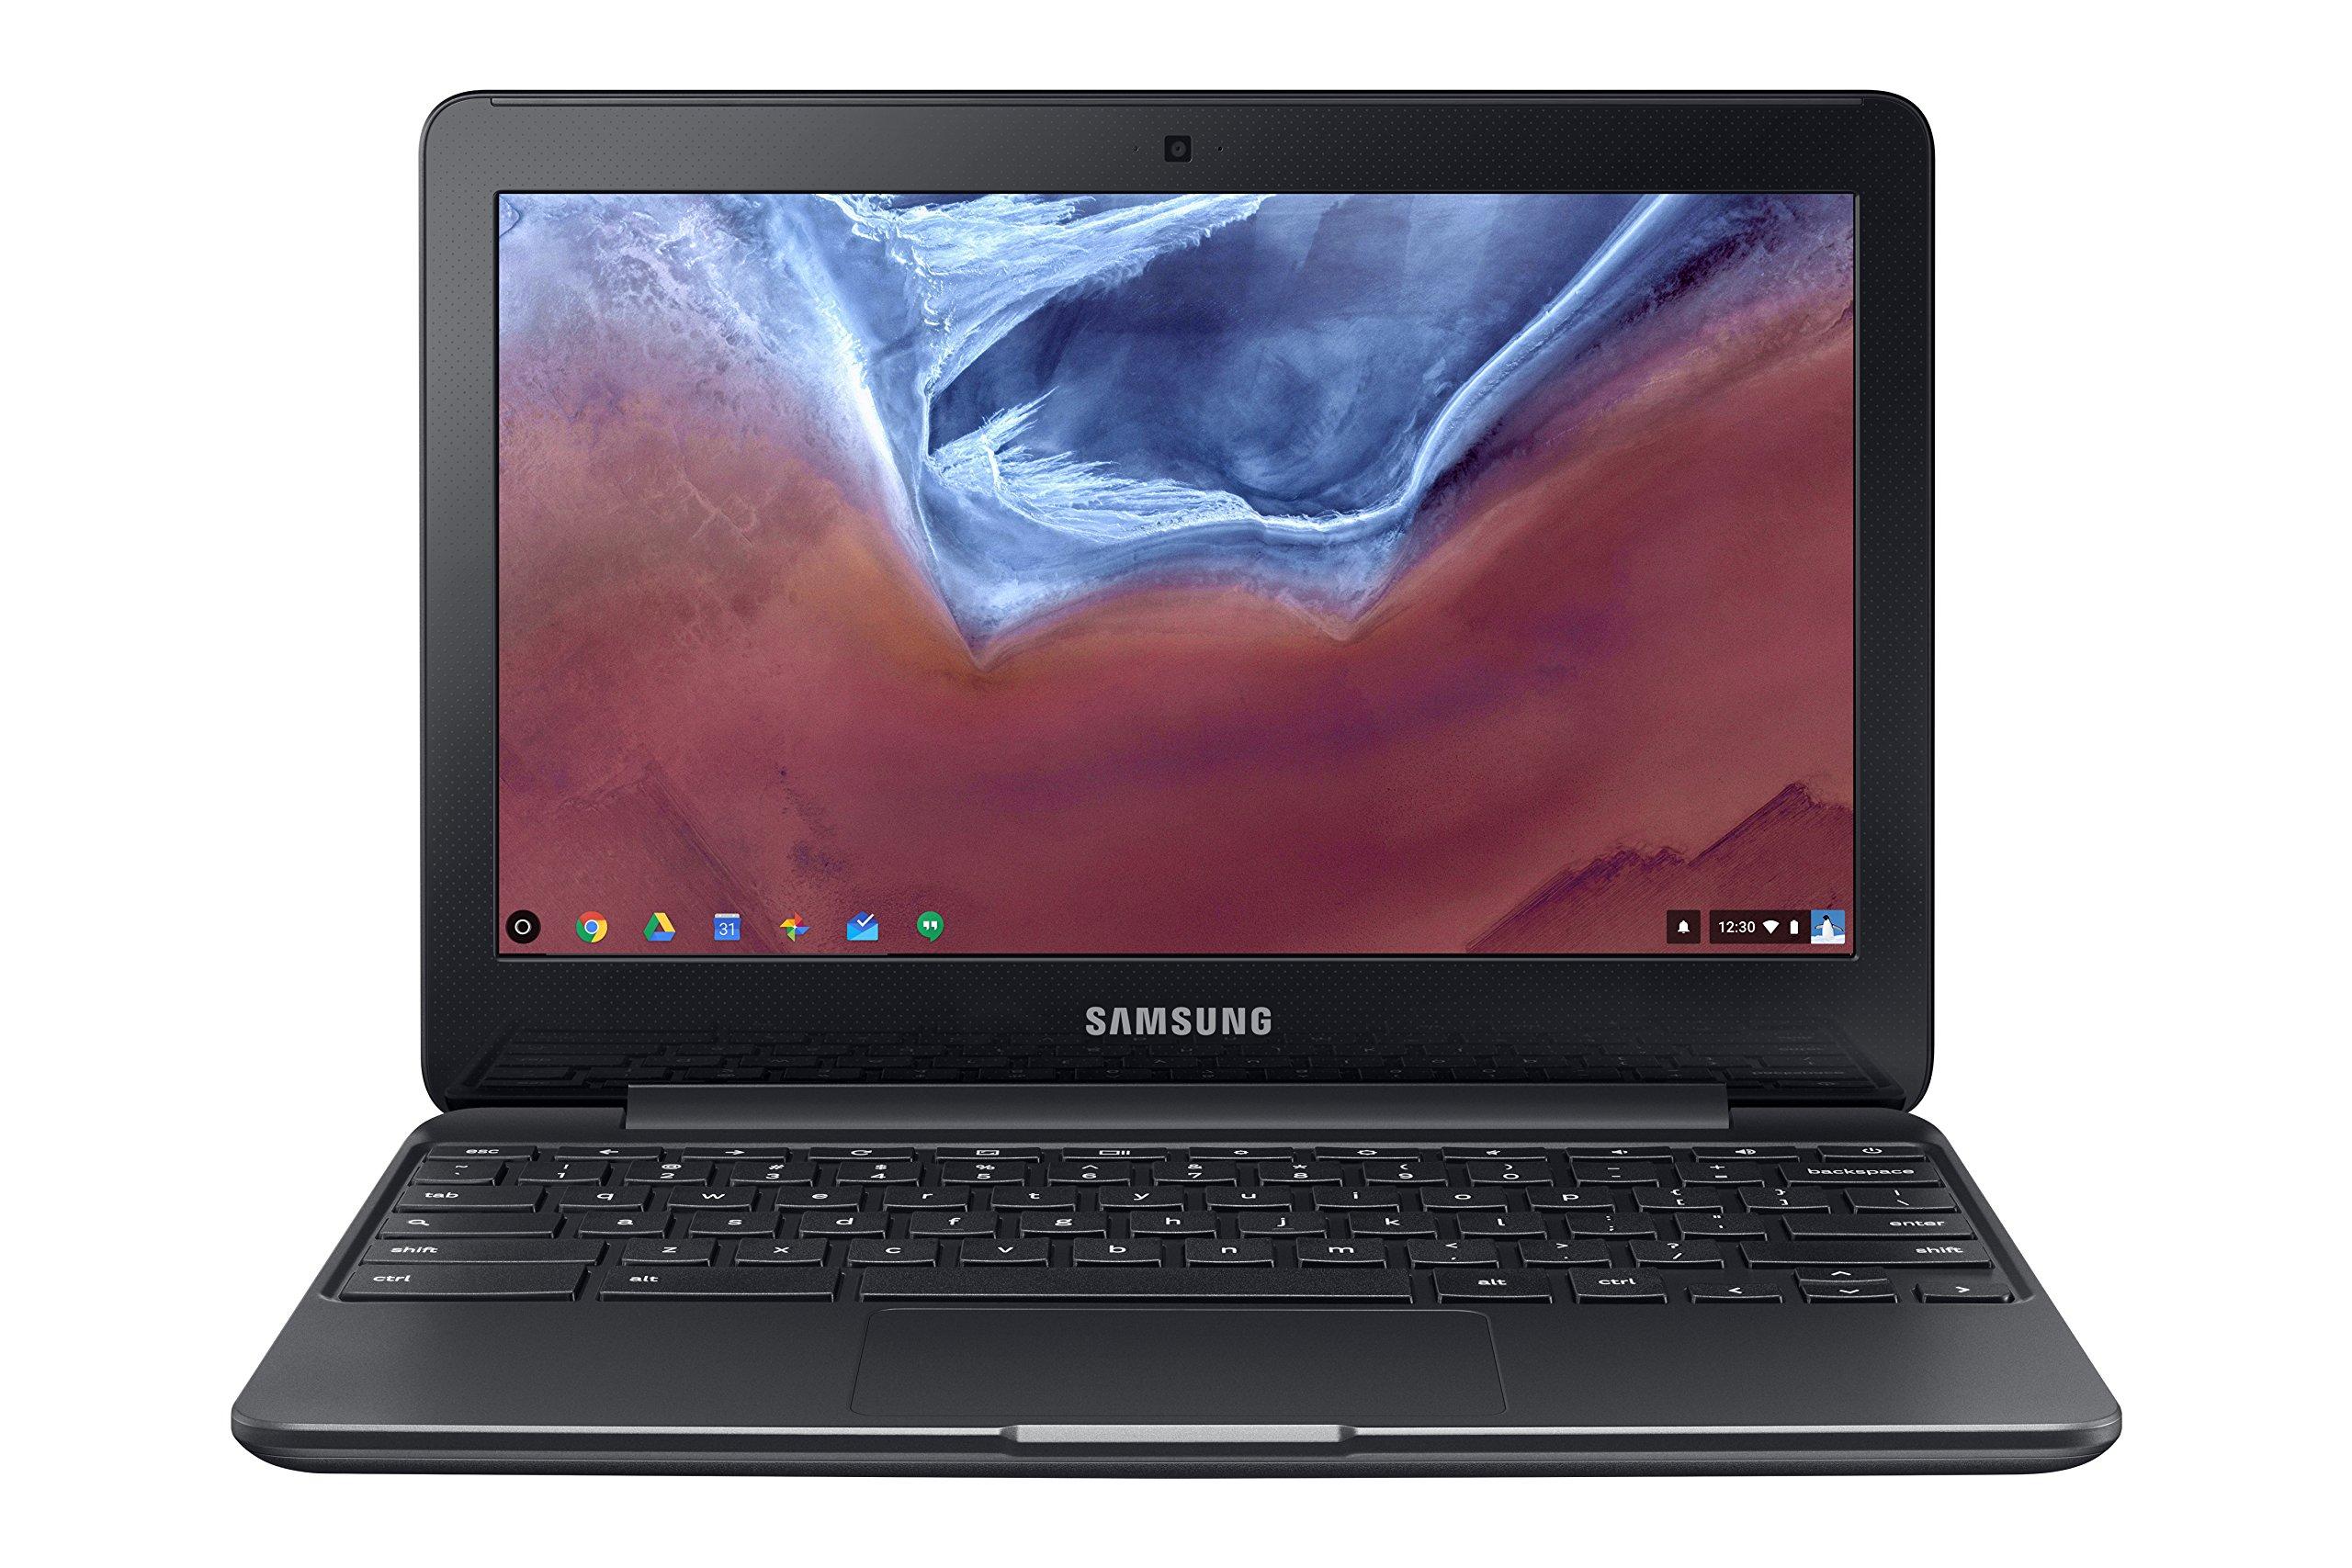 Samsung Chromebook 3 2GB RAM, 11.6'' Chromebook (XE500C13-K05US)